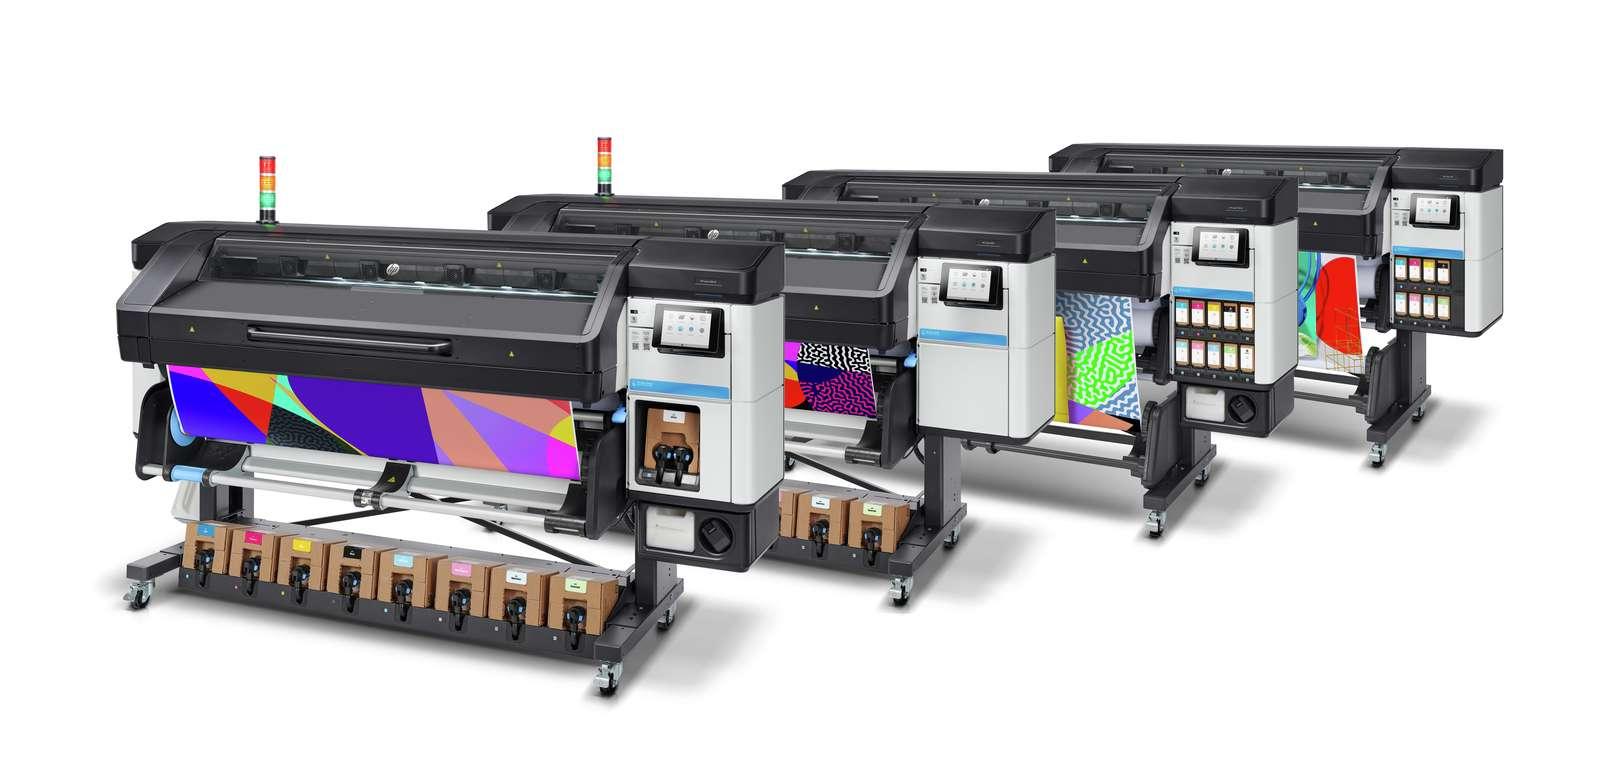 hp latex 700 printer 800 series printer white ink